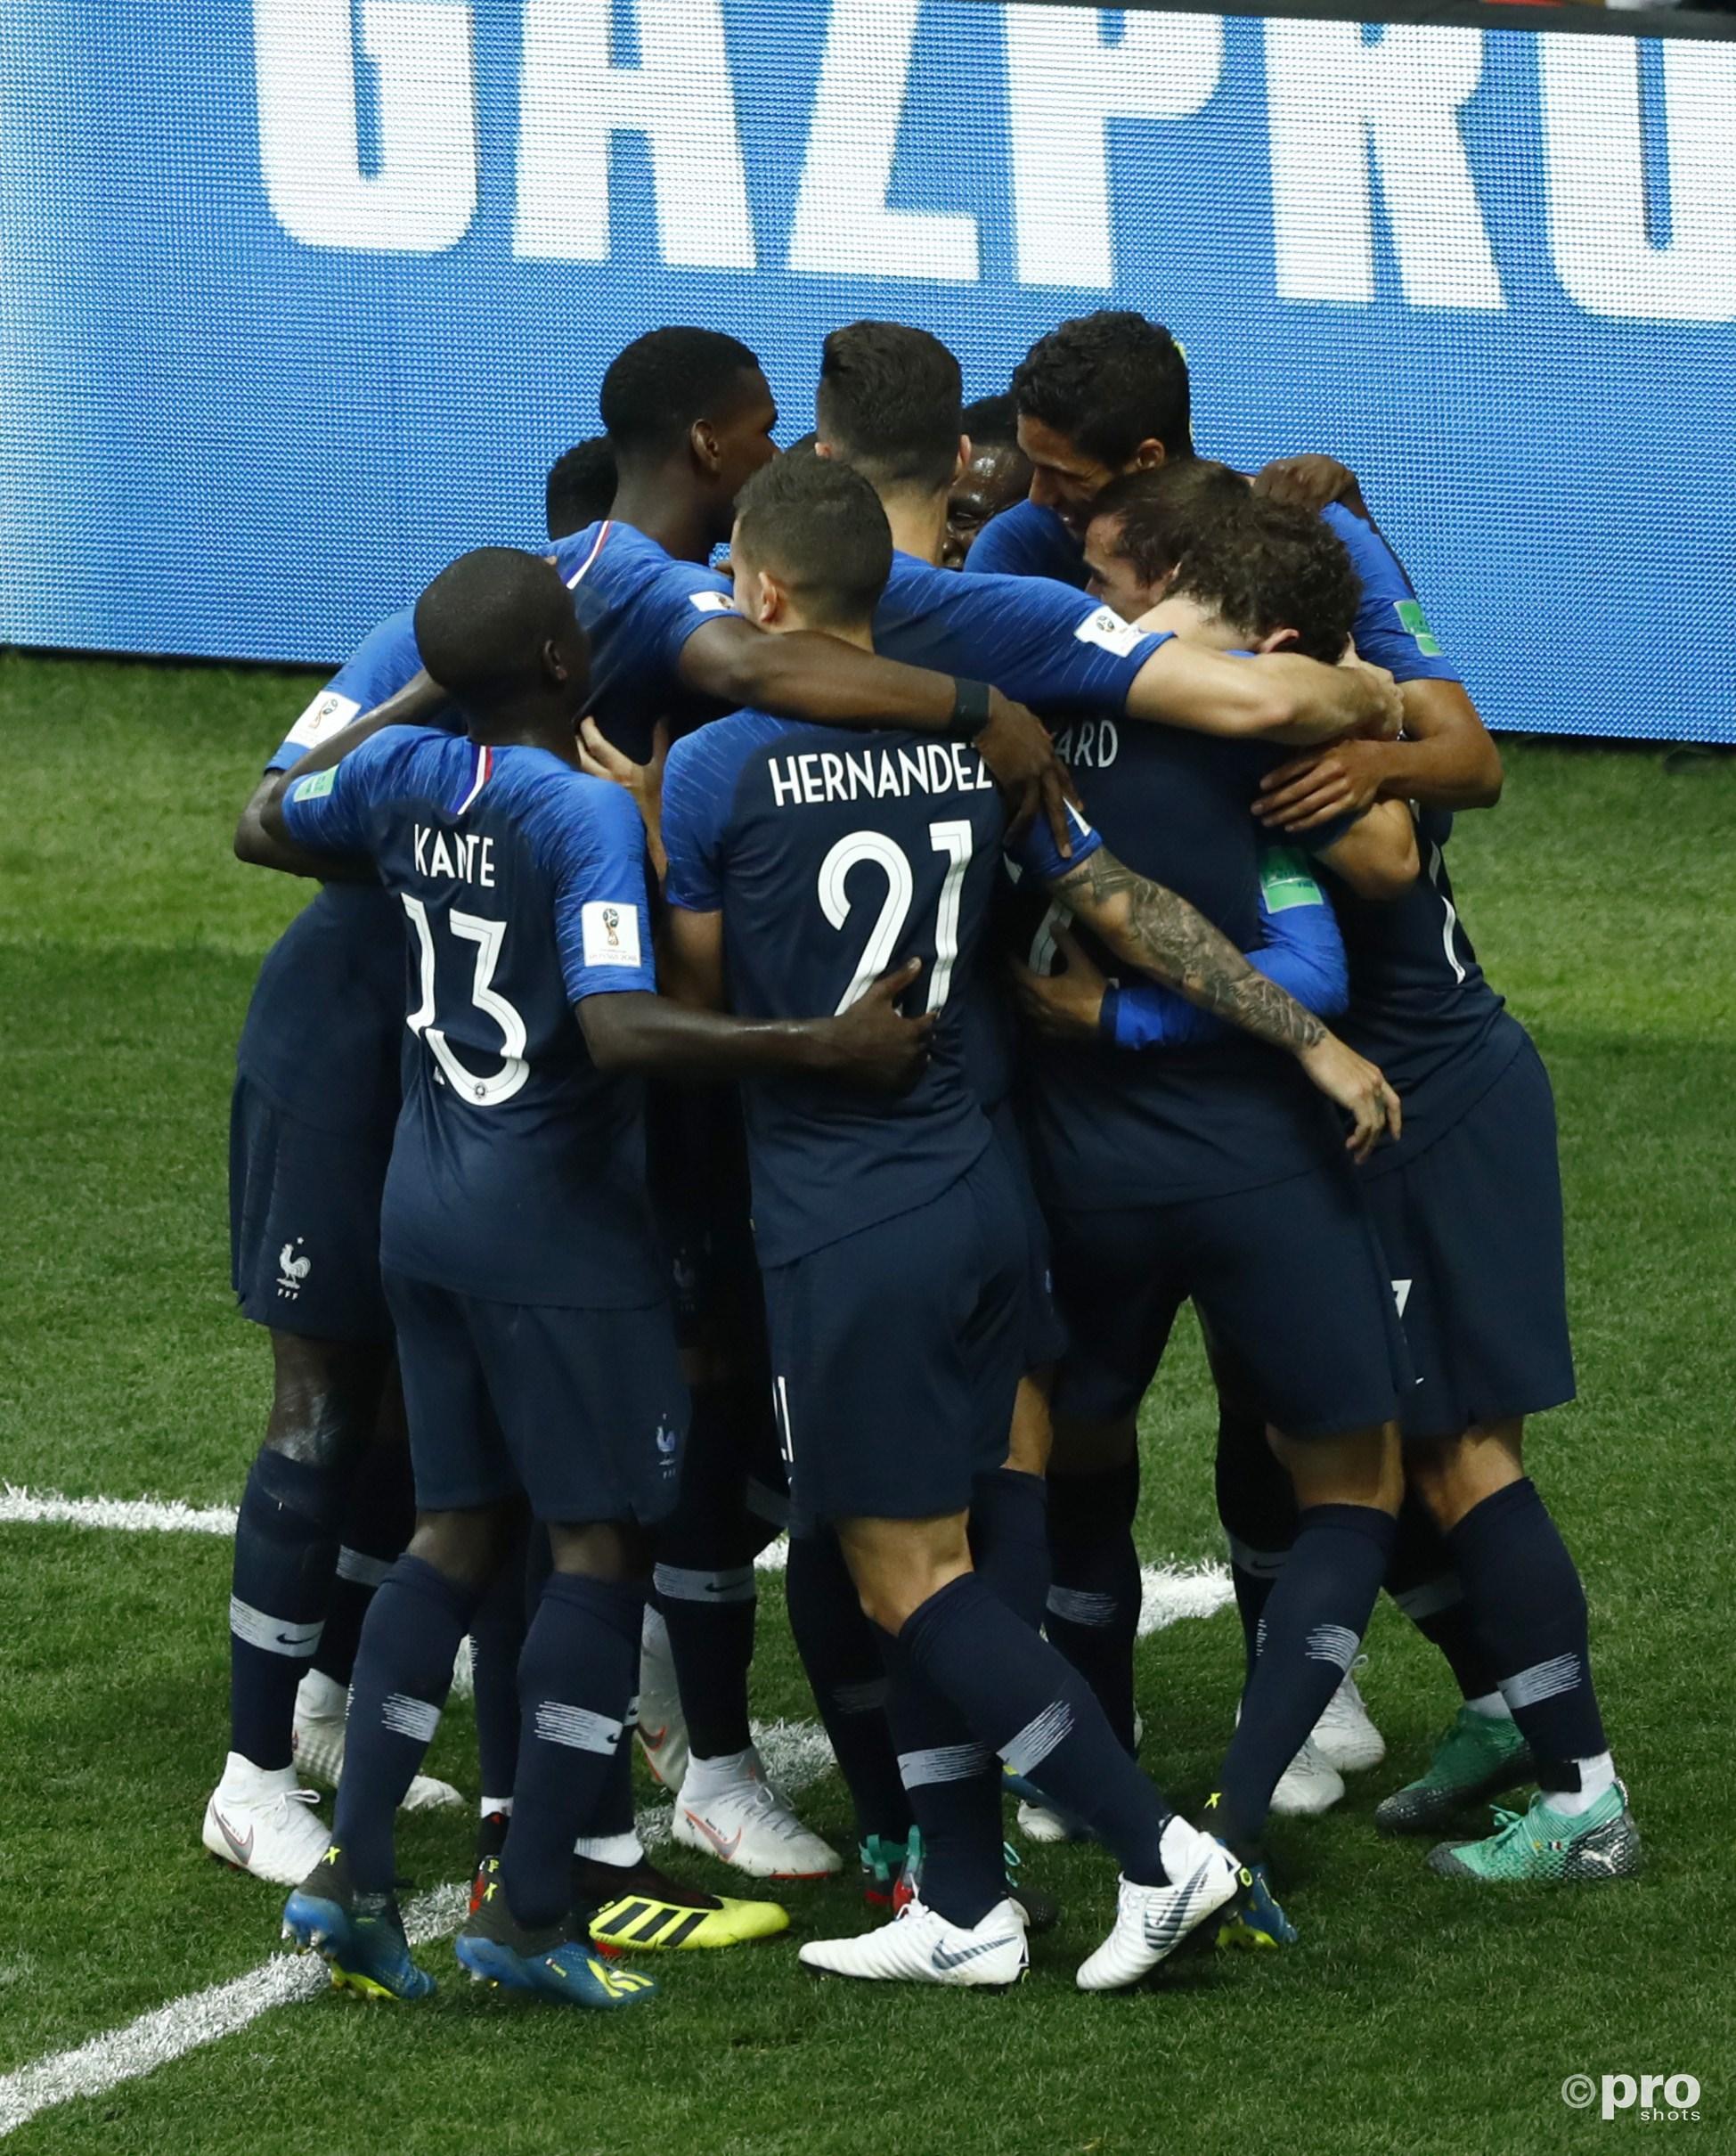 Frankrijk viert feest. (PRO SHOTS/Insidefoto)